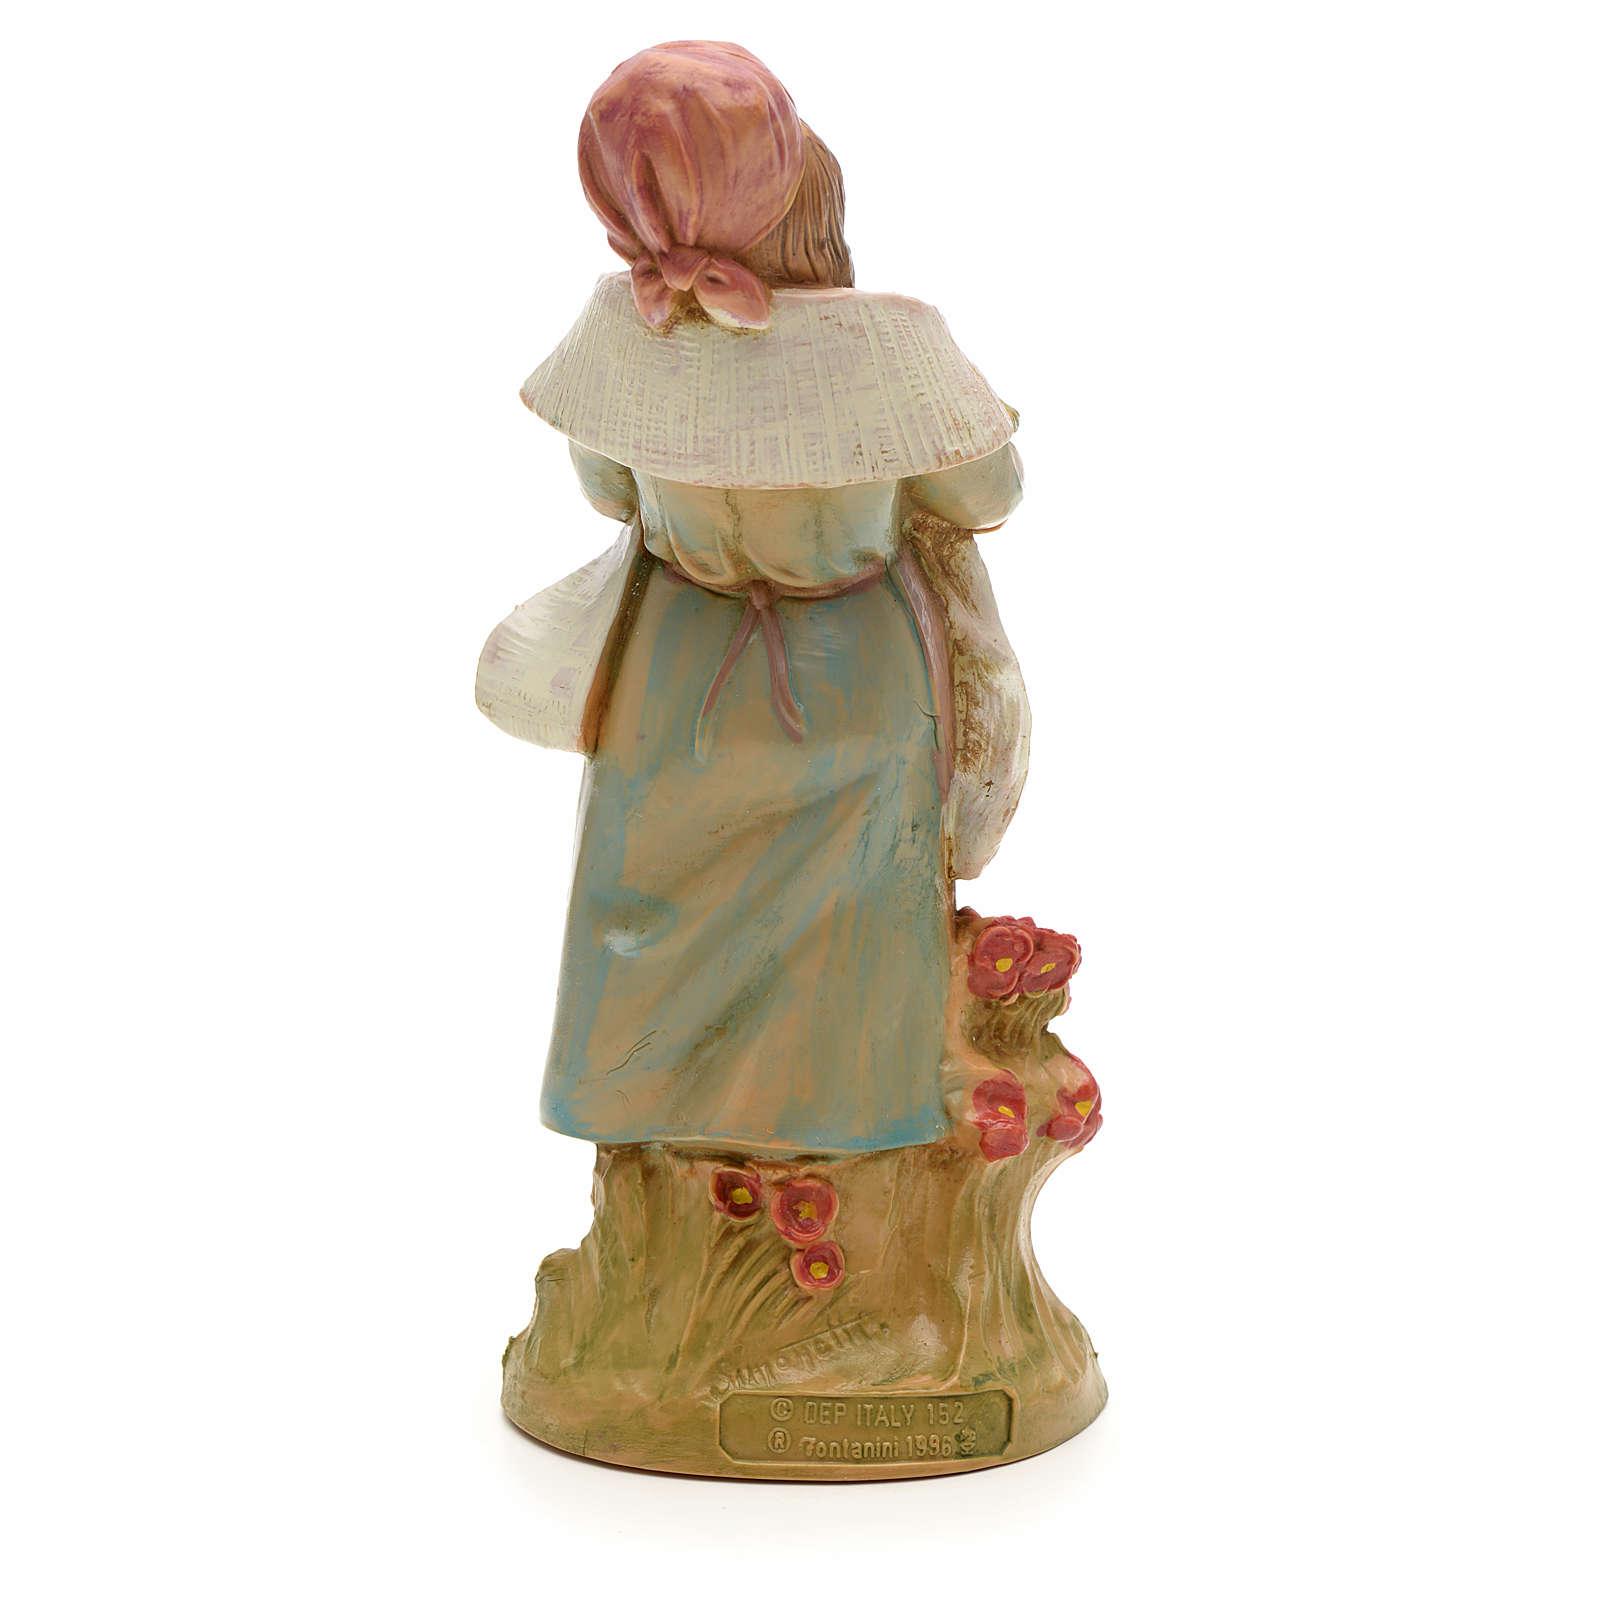 handcolorierte Statuette Hirtenmädchen 12 cm Fontanini 3